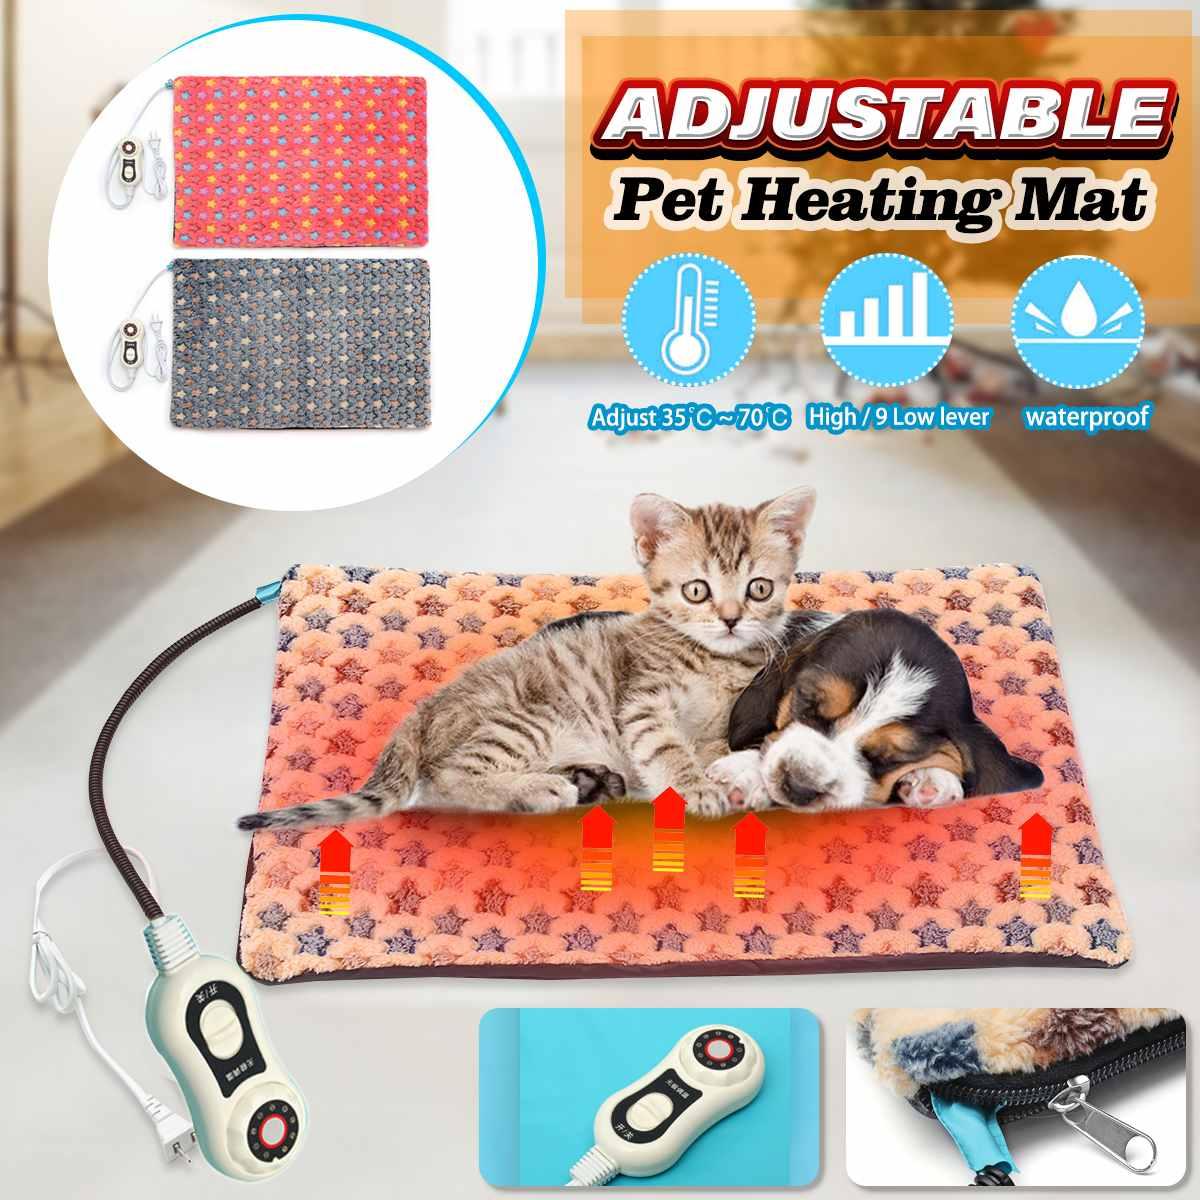 40x60cm 10 Level Pet Dog Cat Waterproof Electric Heating Pad Body Winter Warmer Mat Bed Blanket Animals Heater Random Sent